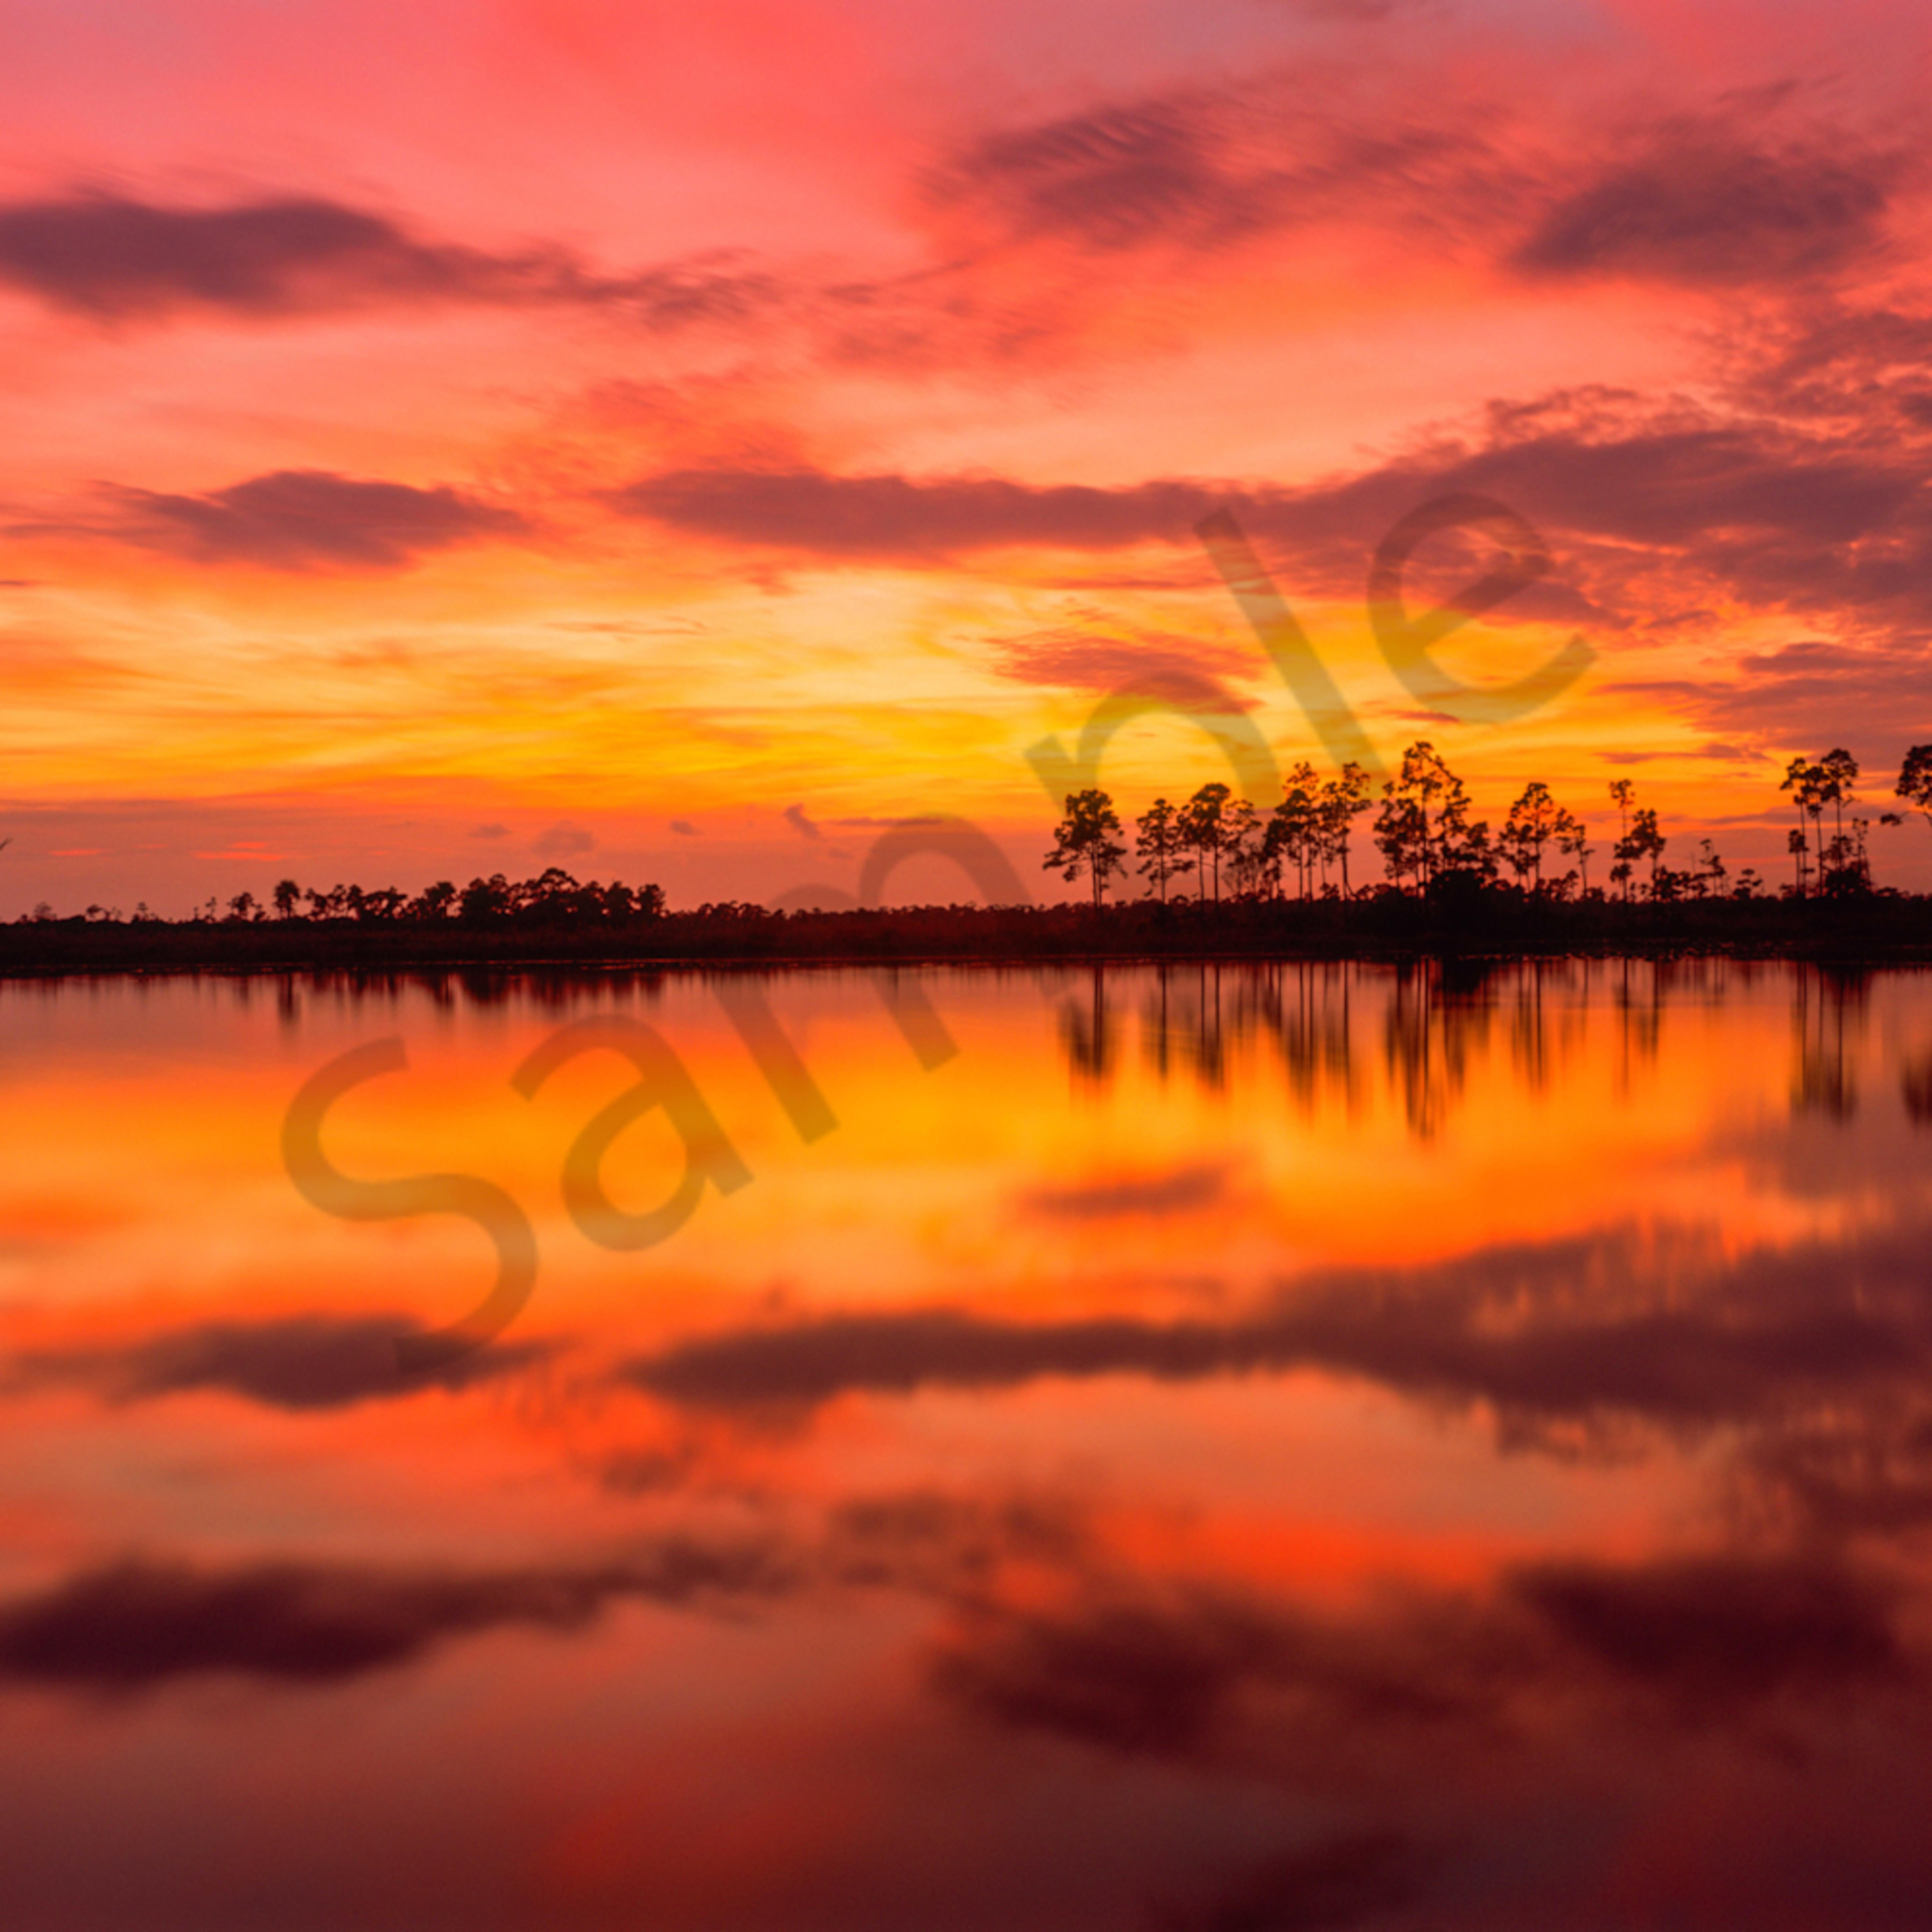 Davidknightphotography ocean beaches sunset atlantic pier 6 k18kwg